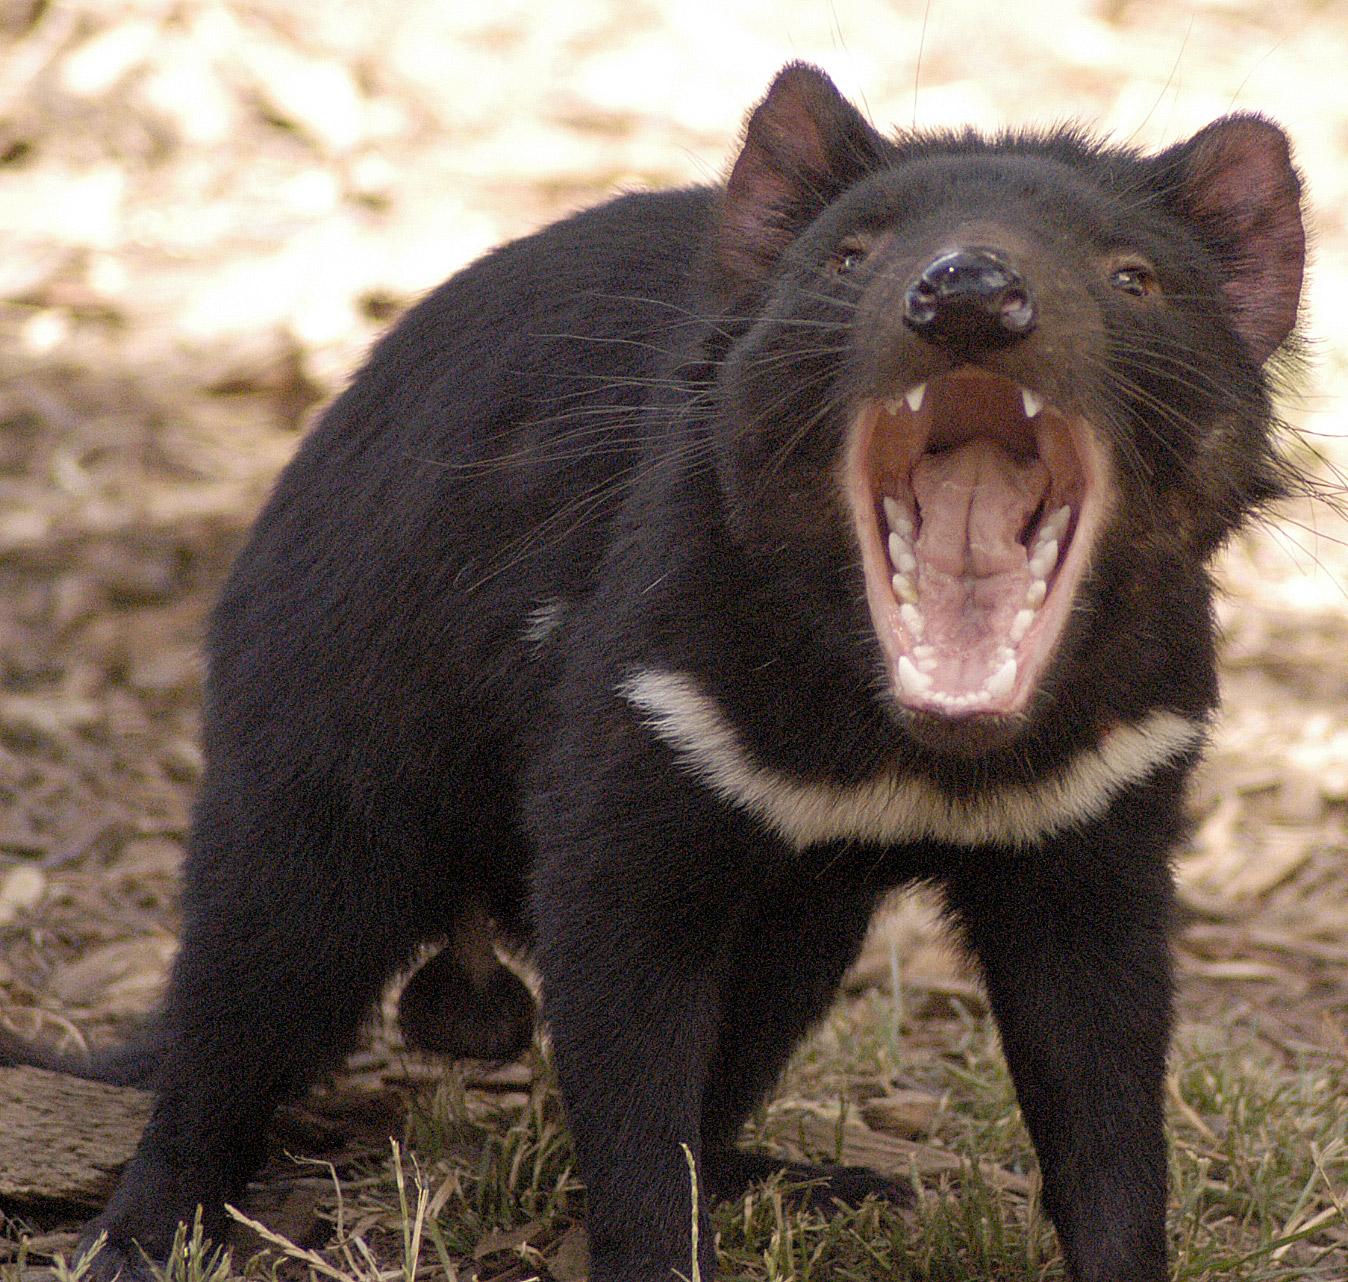 The tasmanian devil all amazing facts the wildlife - Tasmanian devil pics ...